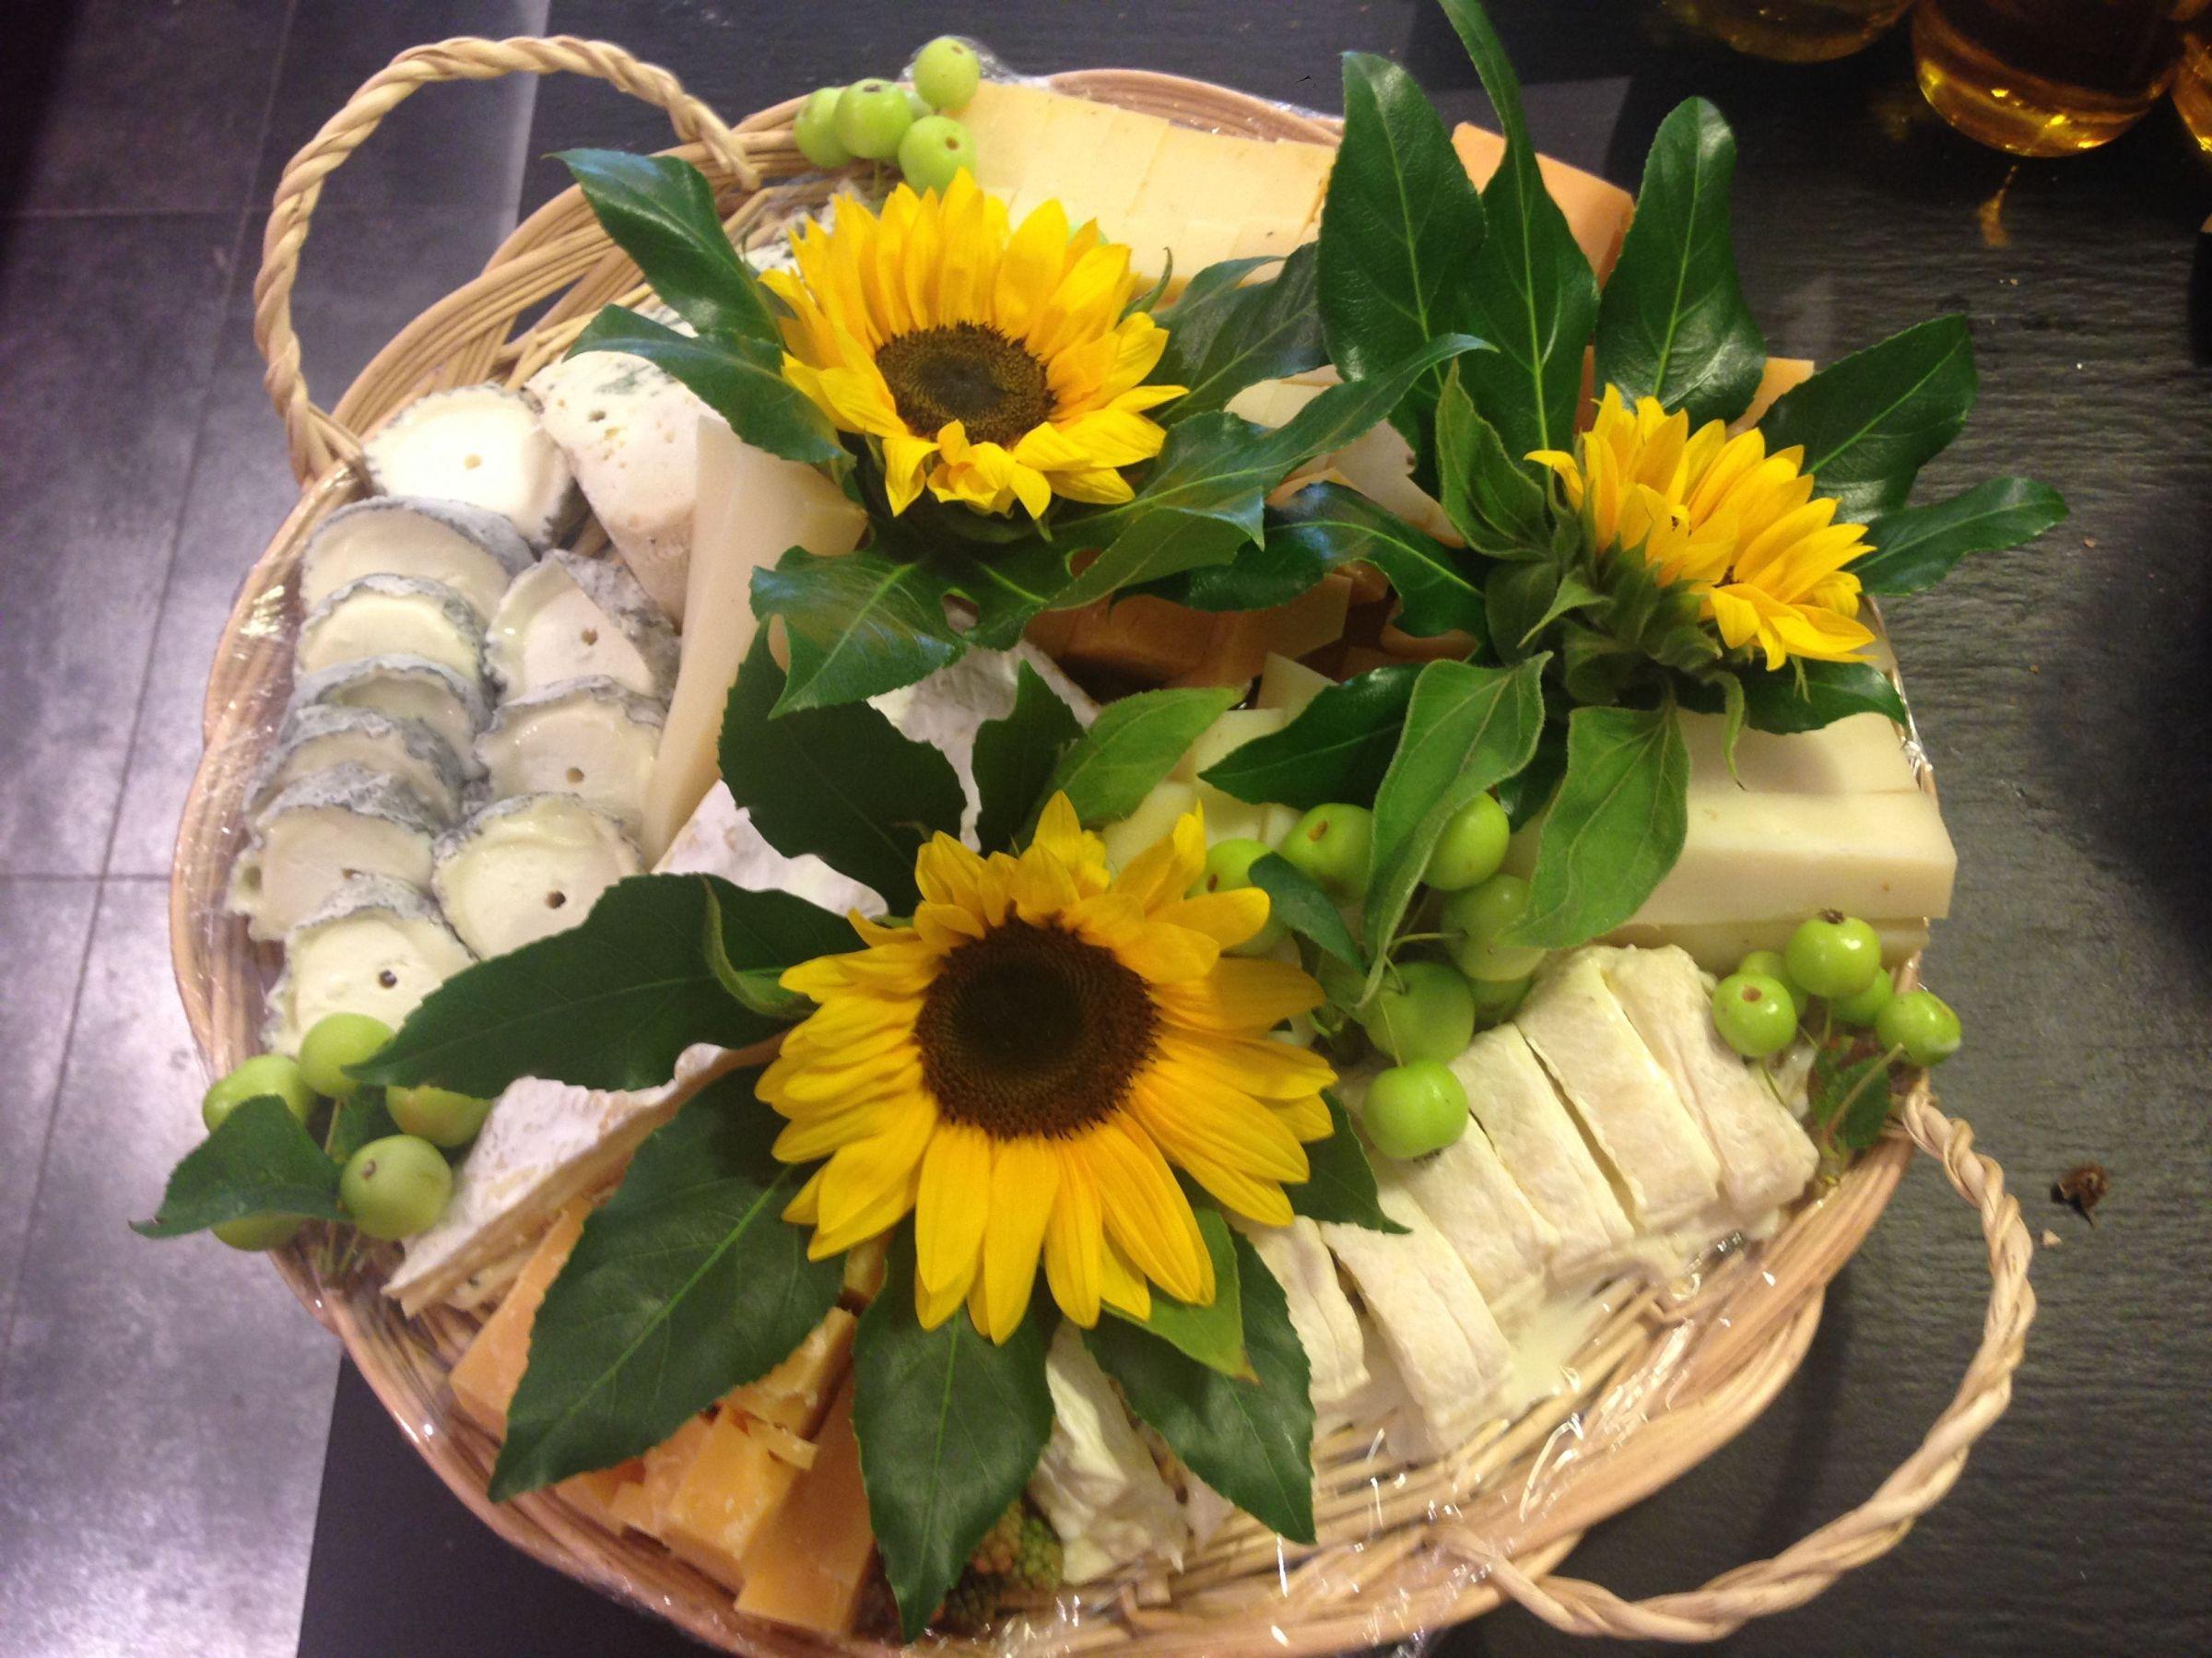 PLATO SOLEIL-le fromage